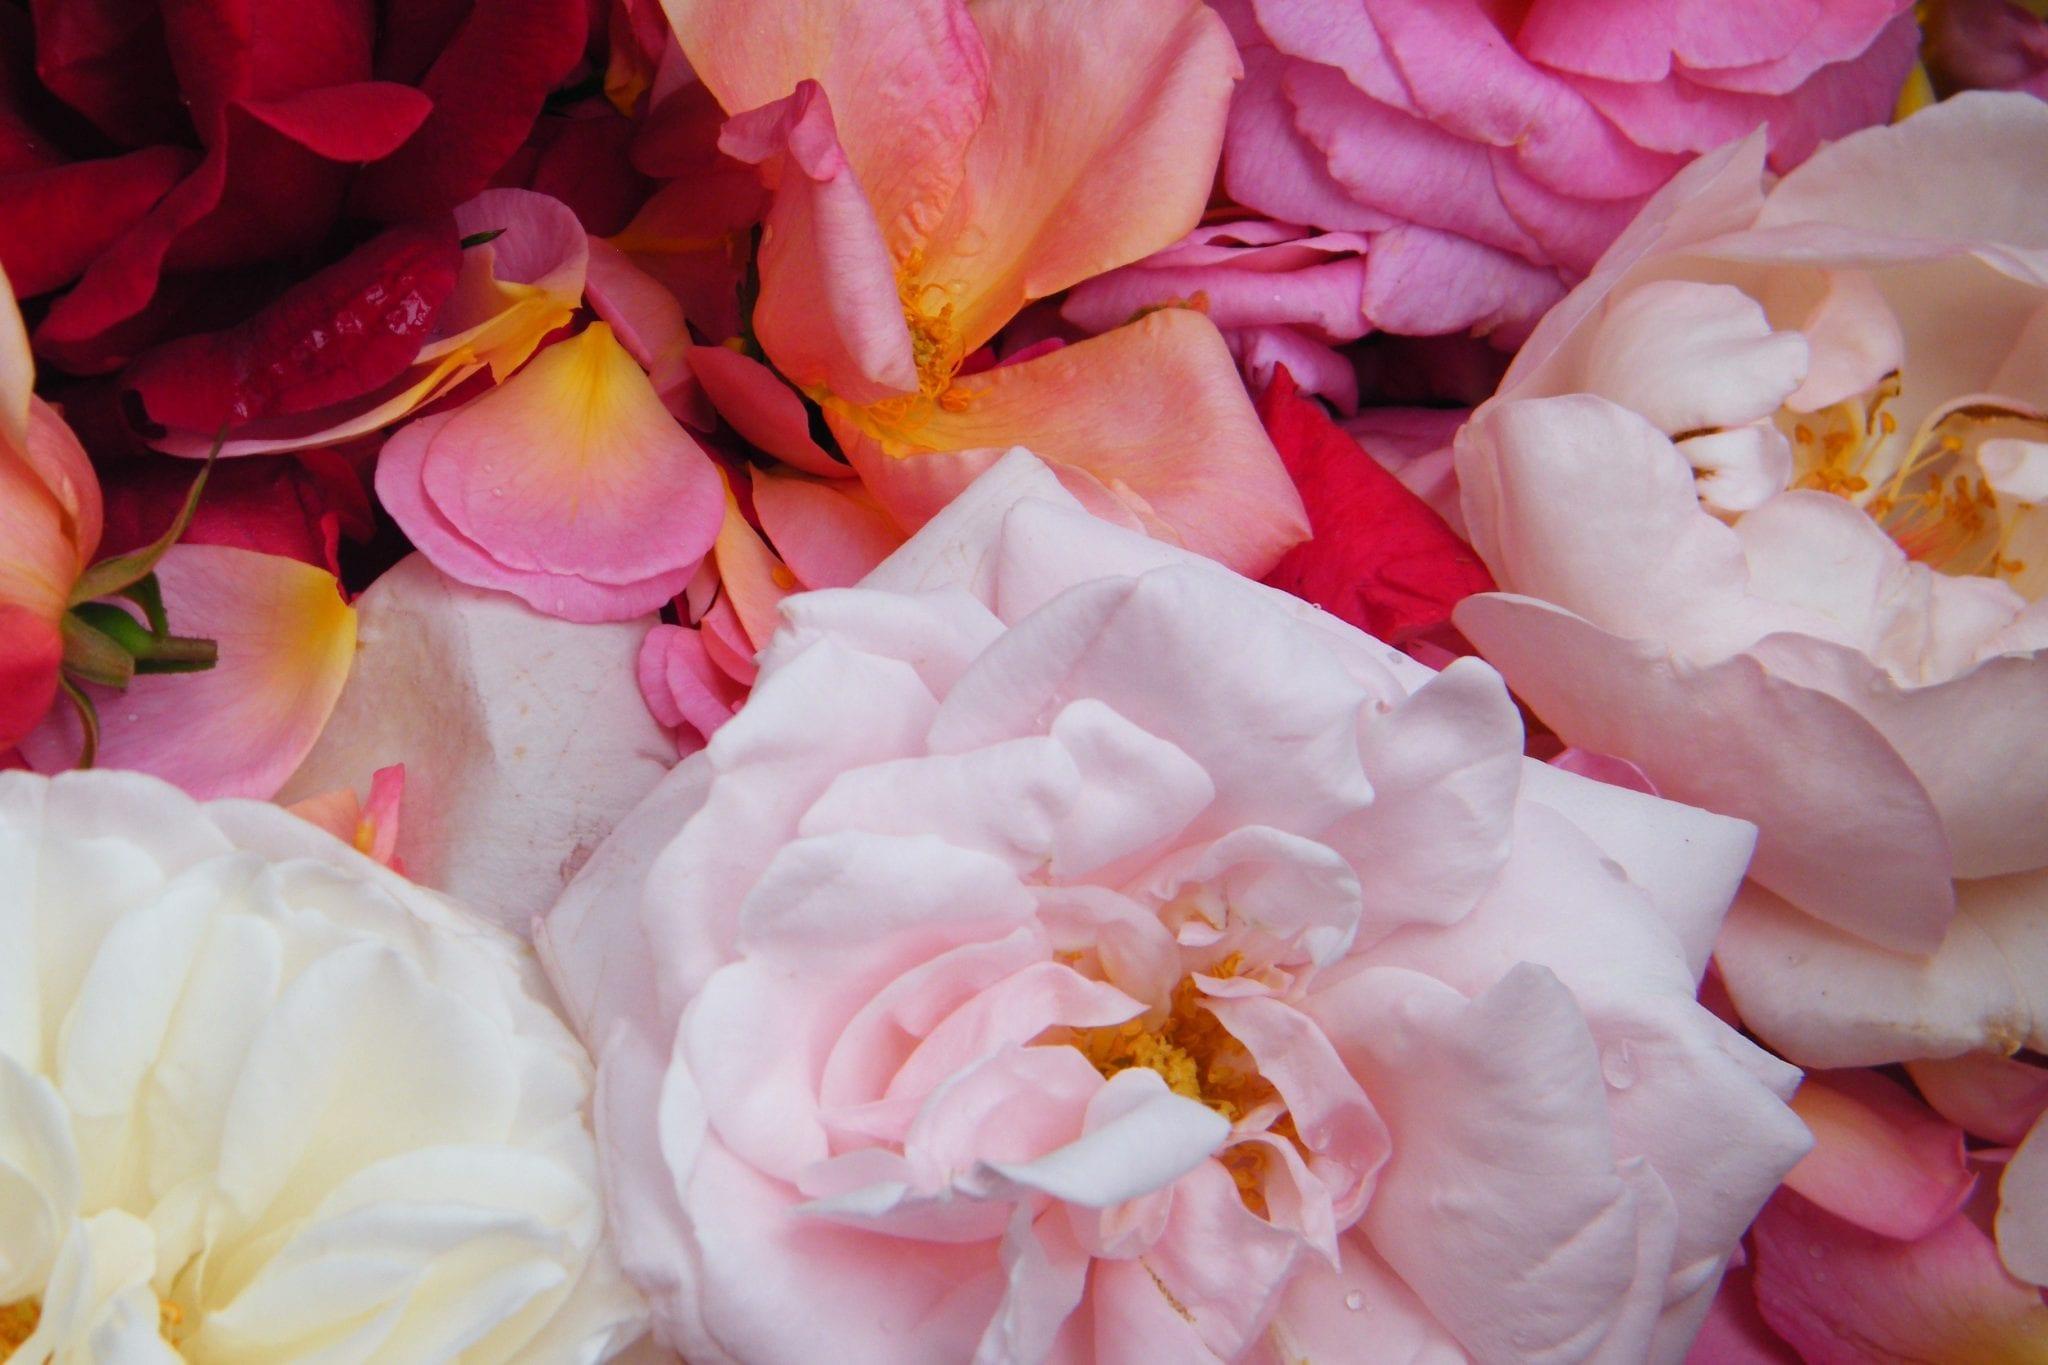 drying rose flowers